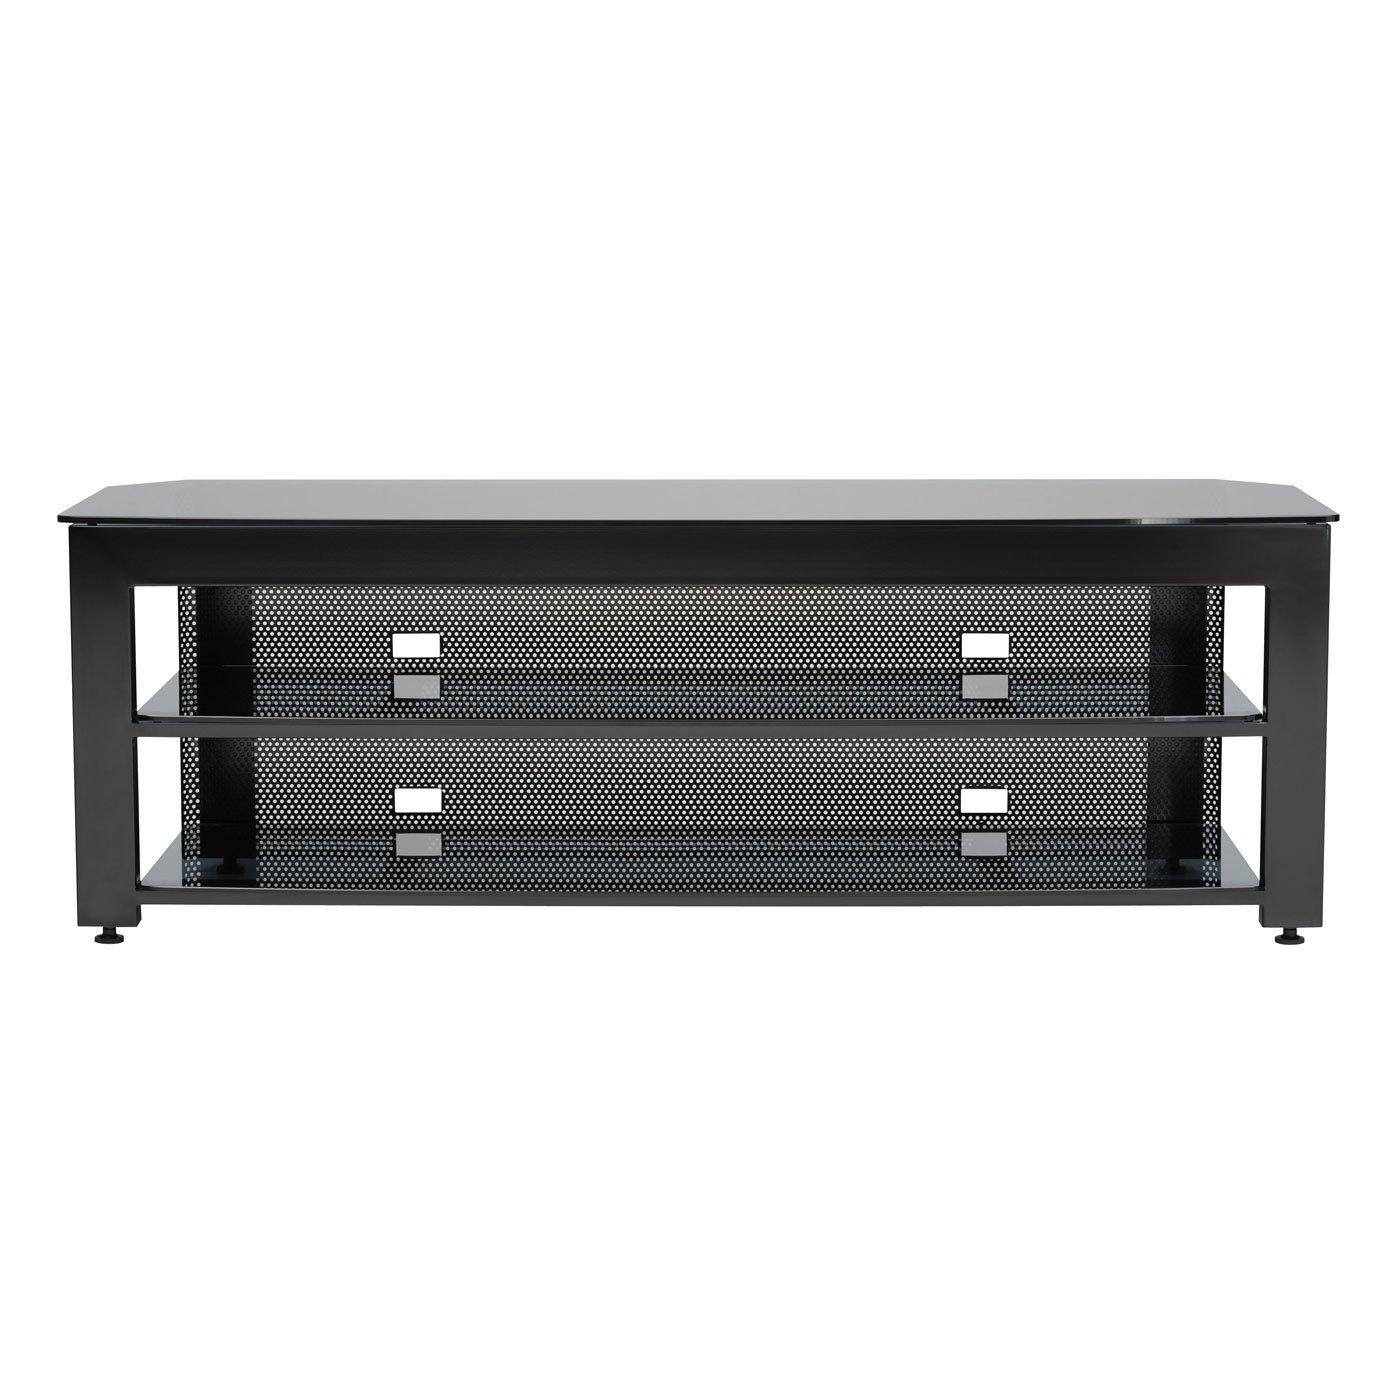 Sanus Steel Furniture 65 Wide AV Stand GEN 2 Black